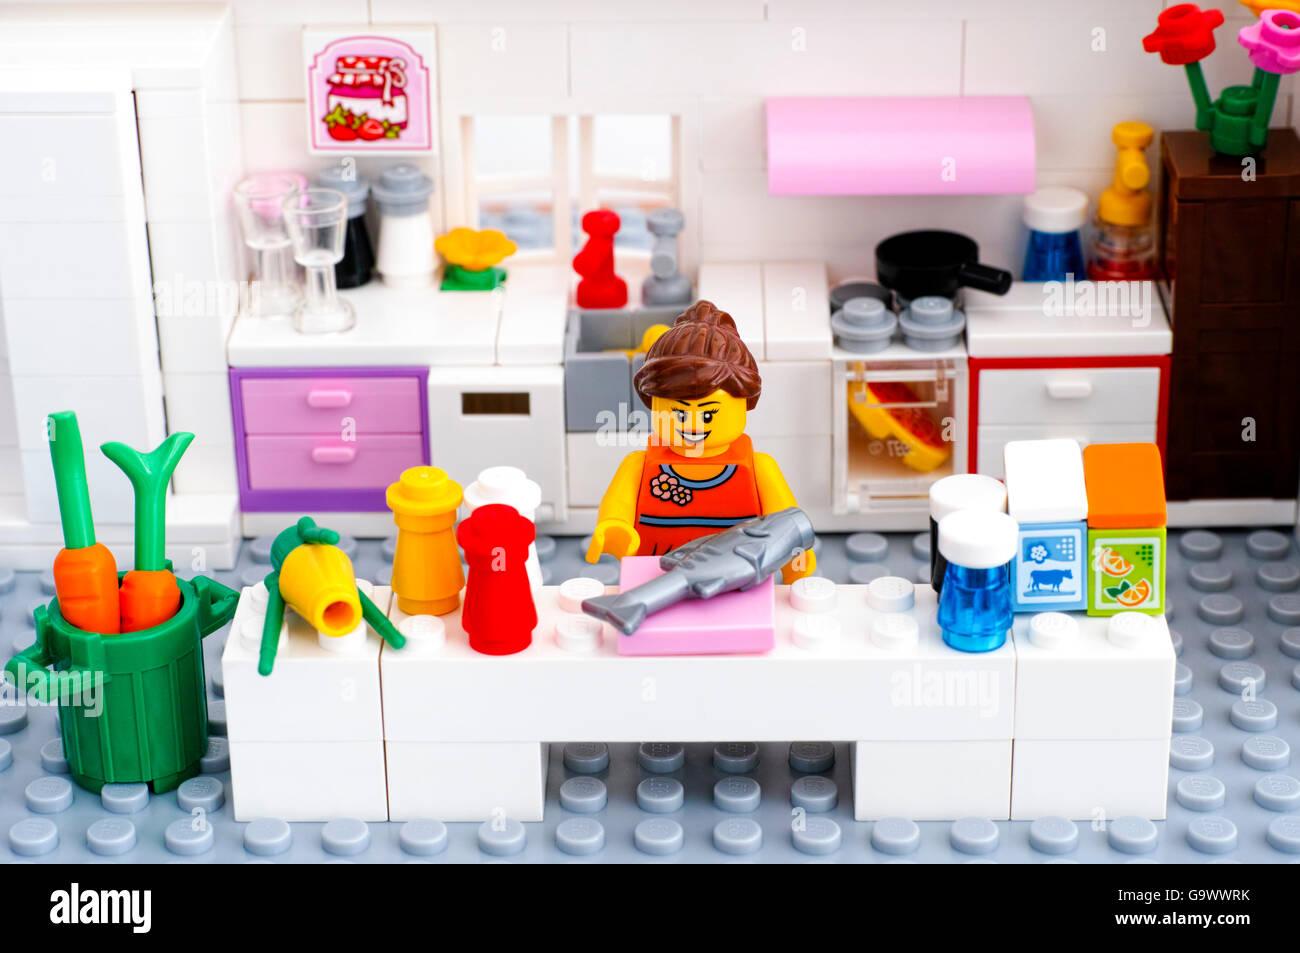 Lego Woman Stockfotos & Lego Woman Bilder - Alamy